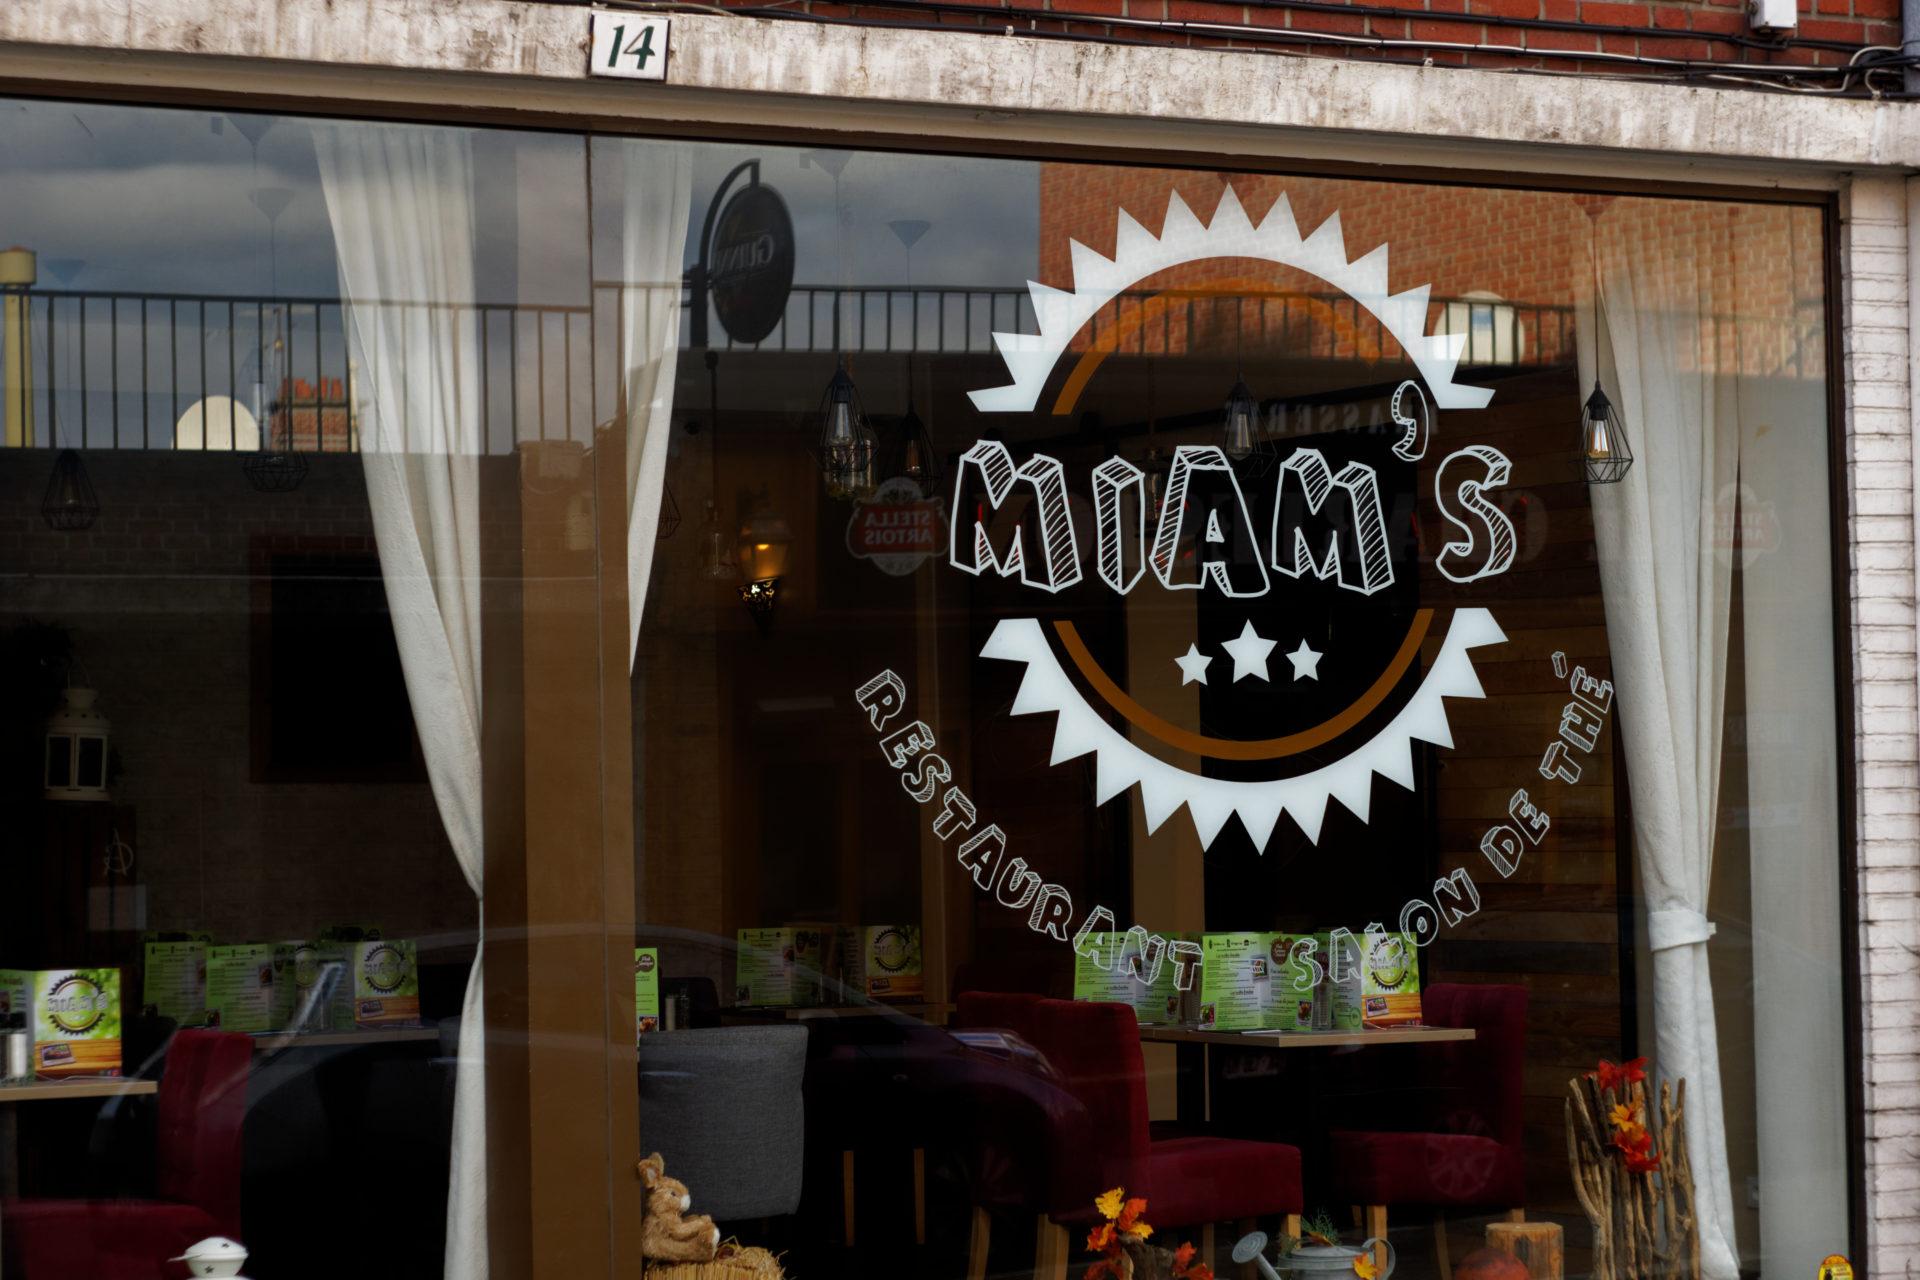 vitrine-du-miam-s-a-amiens-cafe-restaurant-a-visiter-bio-healthy-alexandre-bridenne